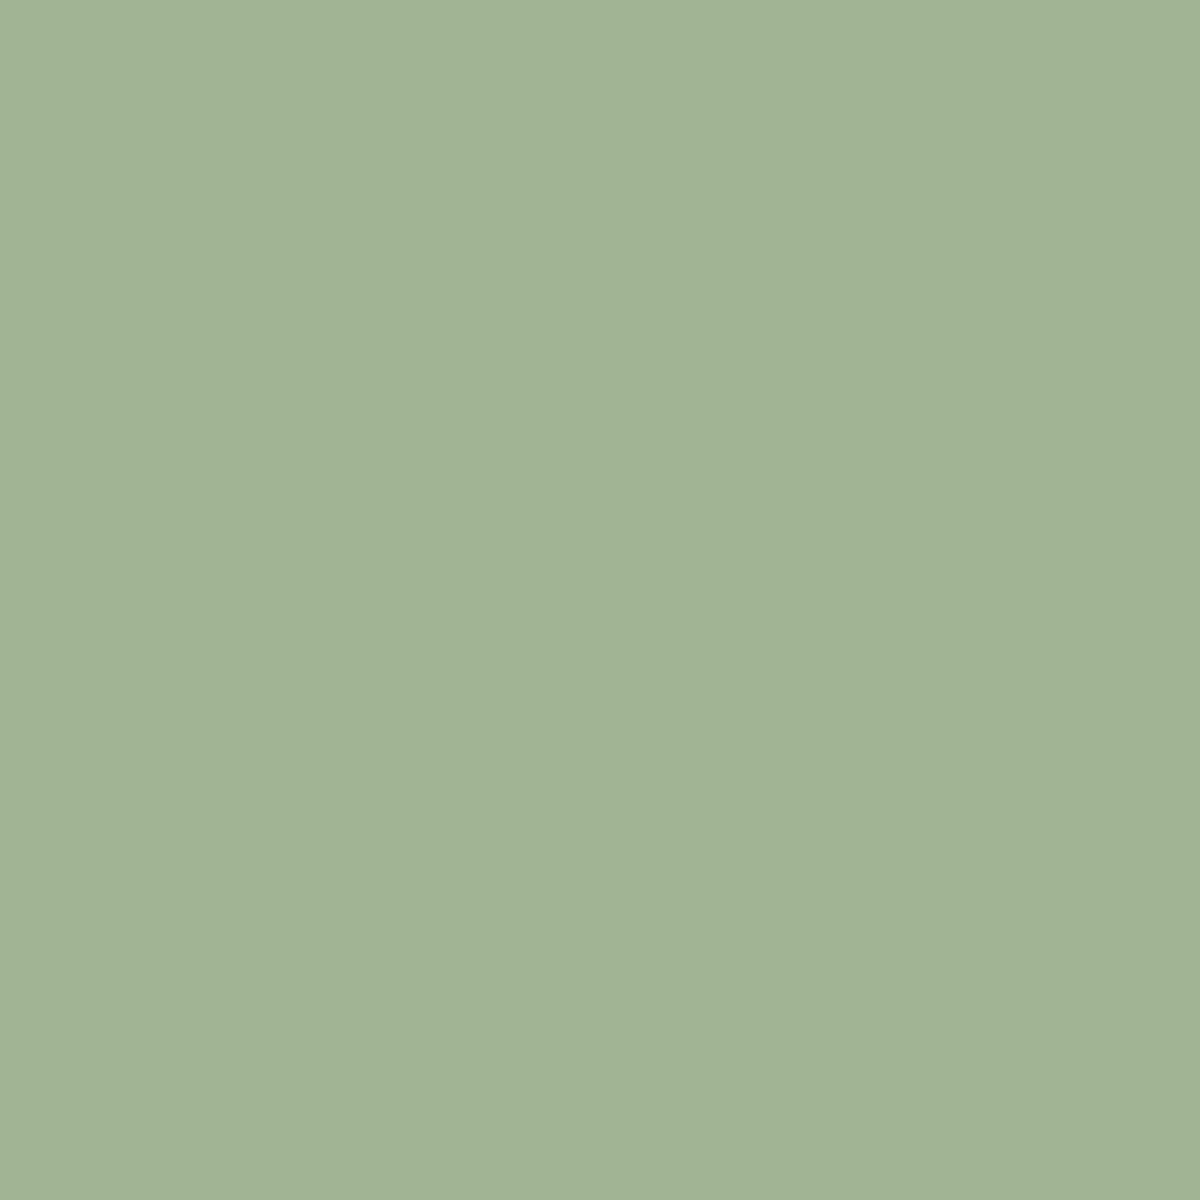 76572 - Neutral Gray - 1# Bag